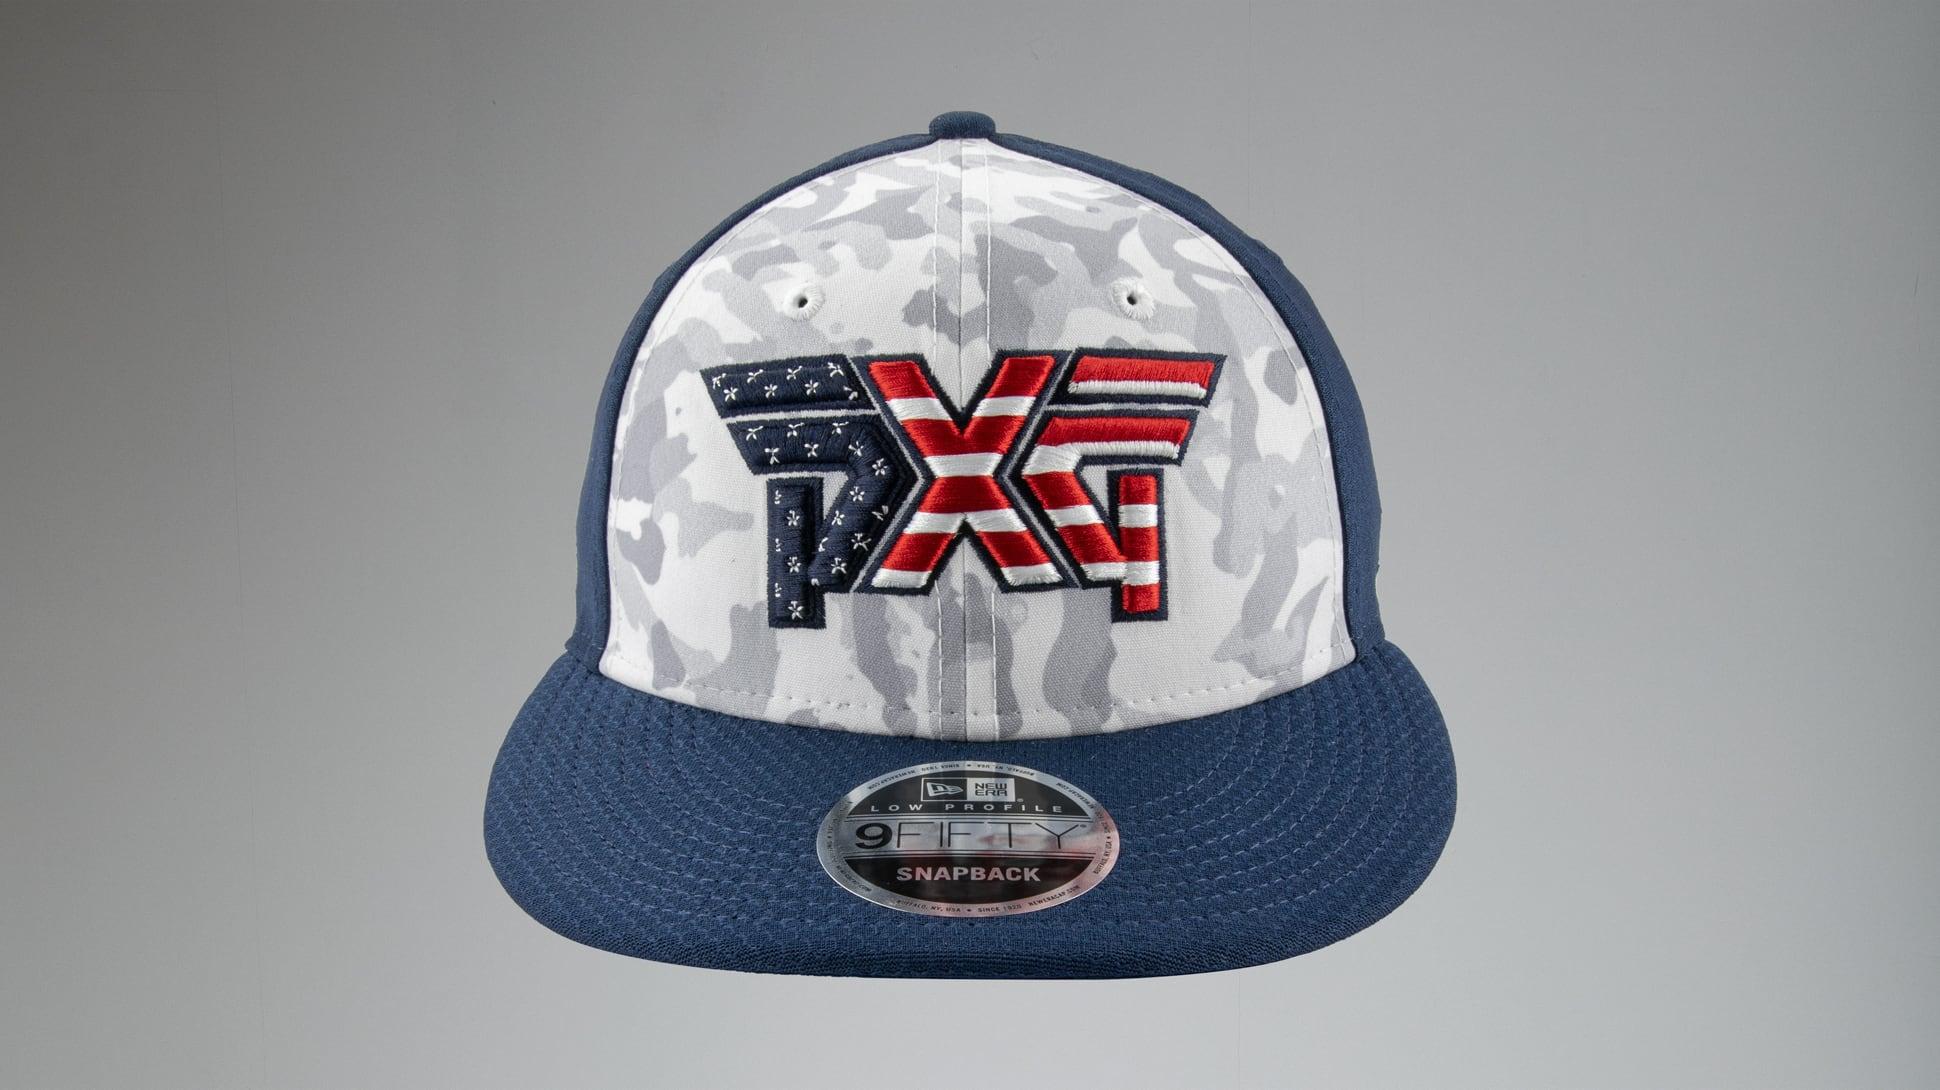 USA 9FIFTY Cap Image 2